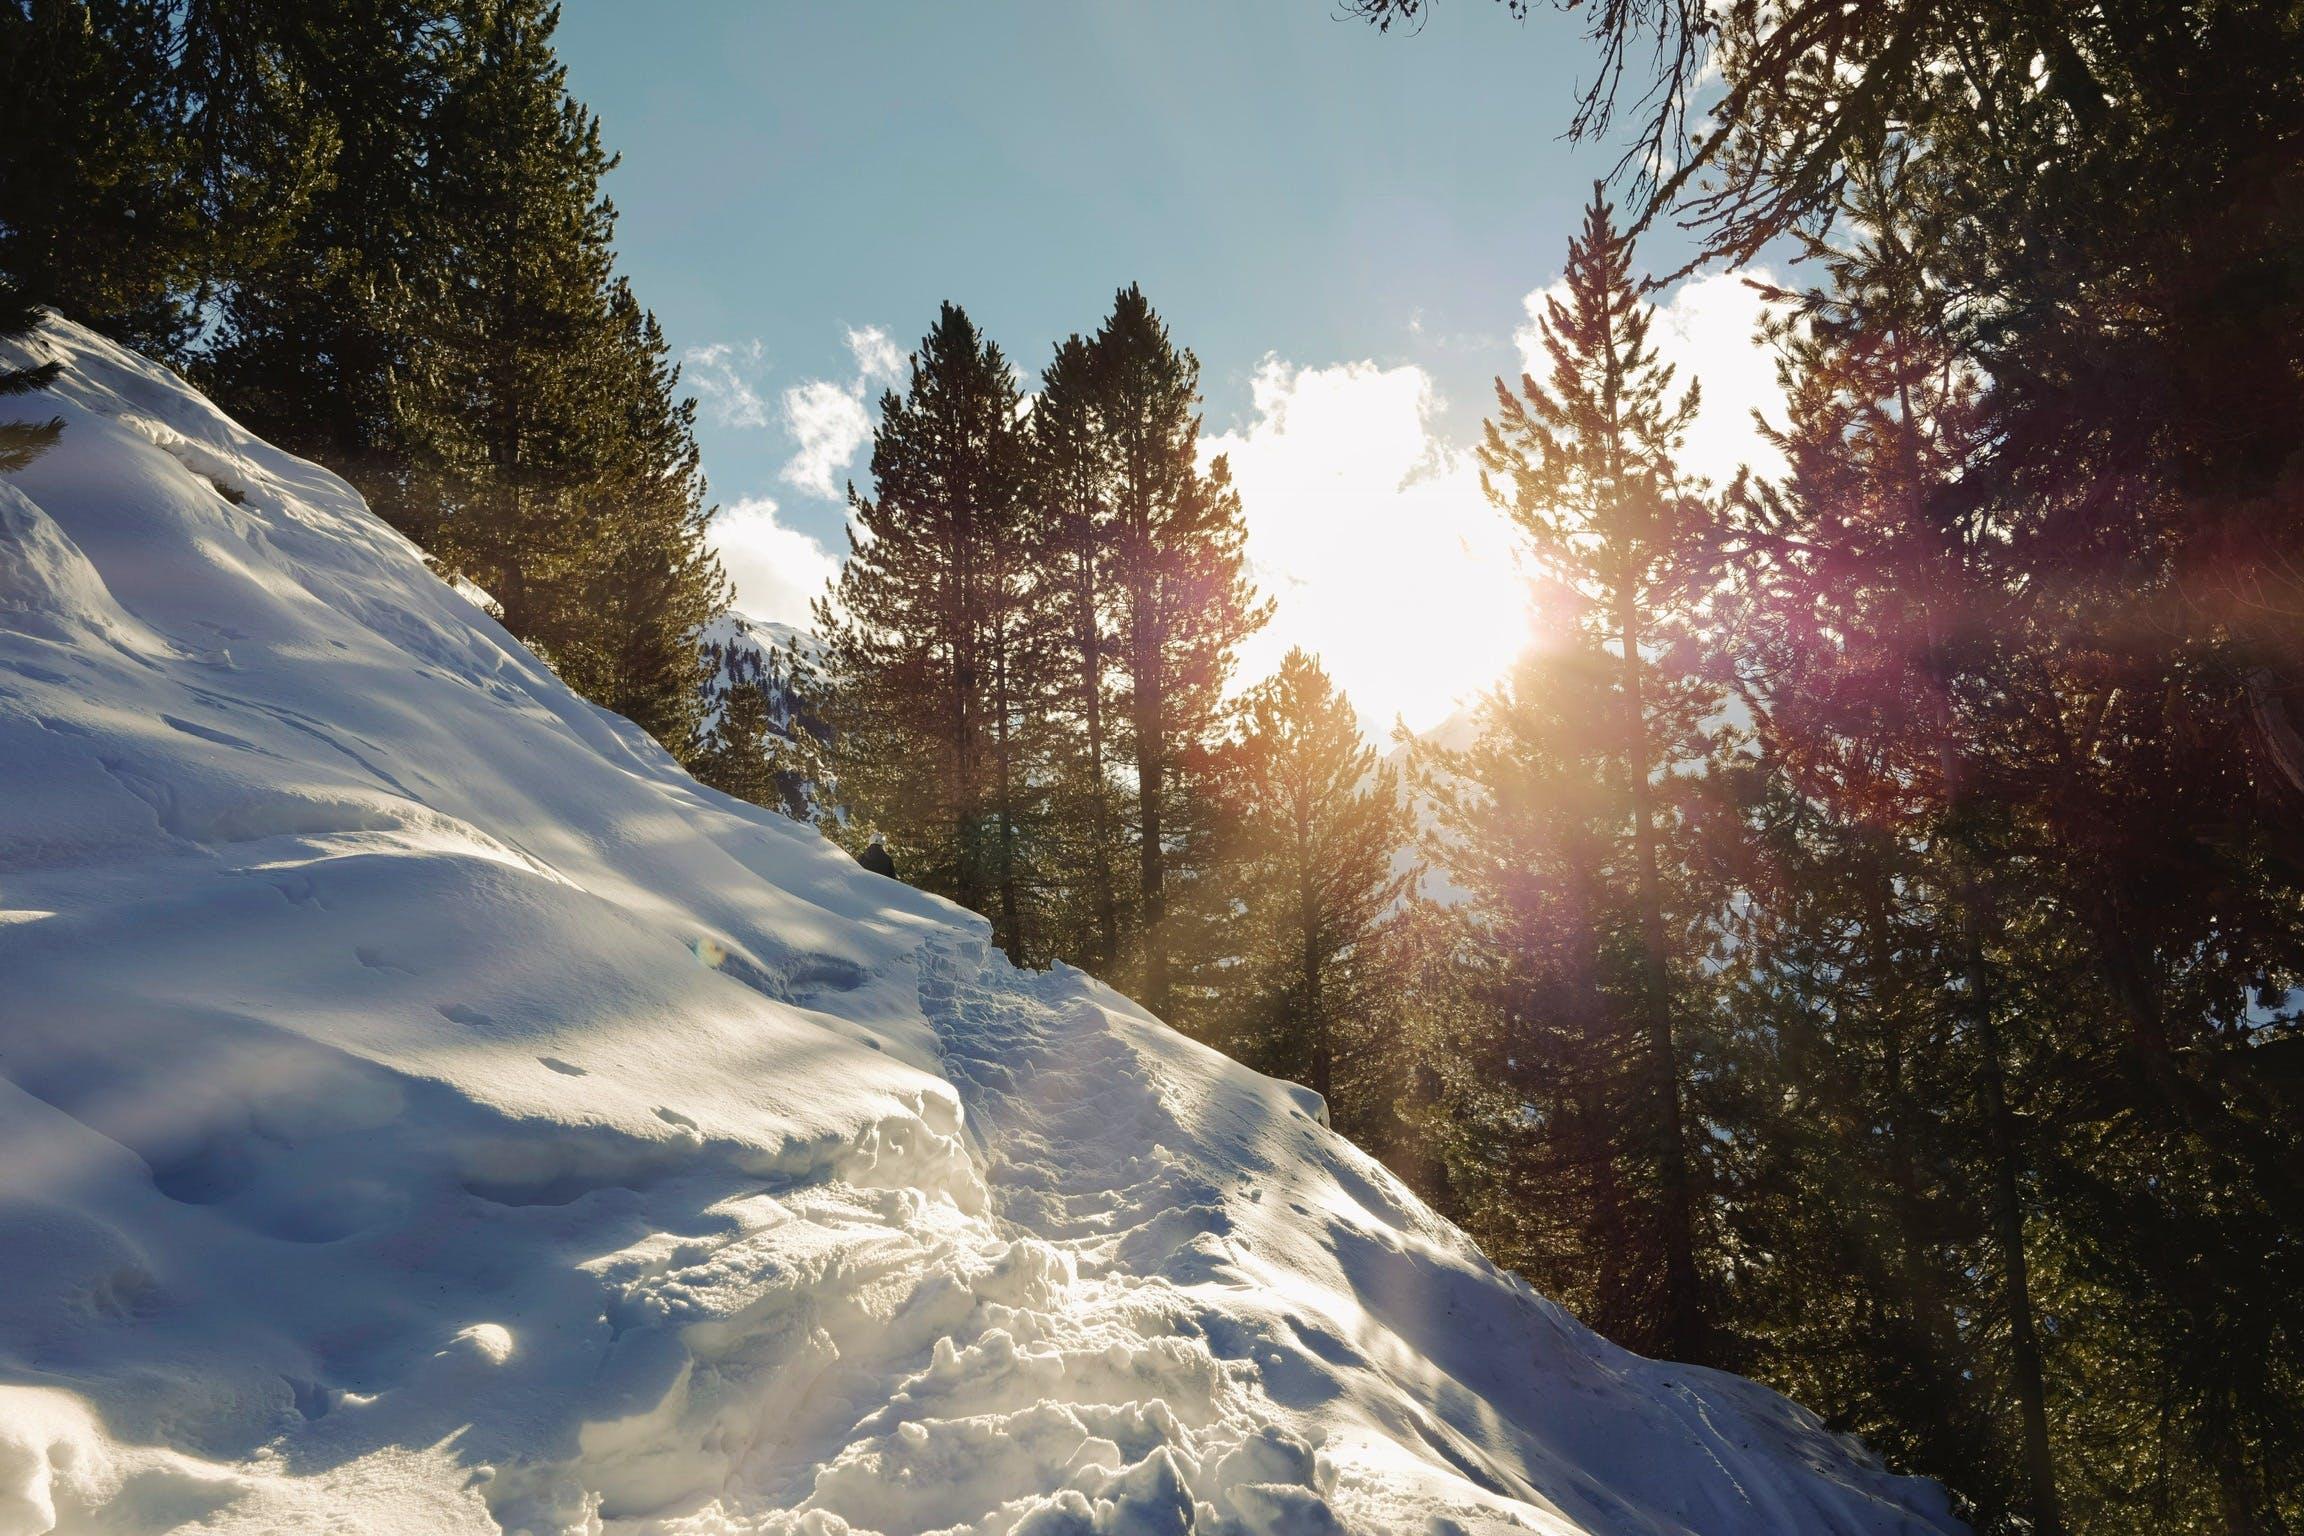 Free stock photo of free, gold, powder, skiing